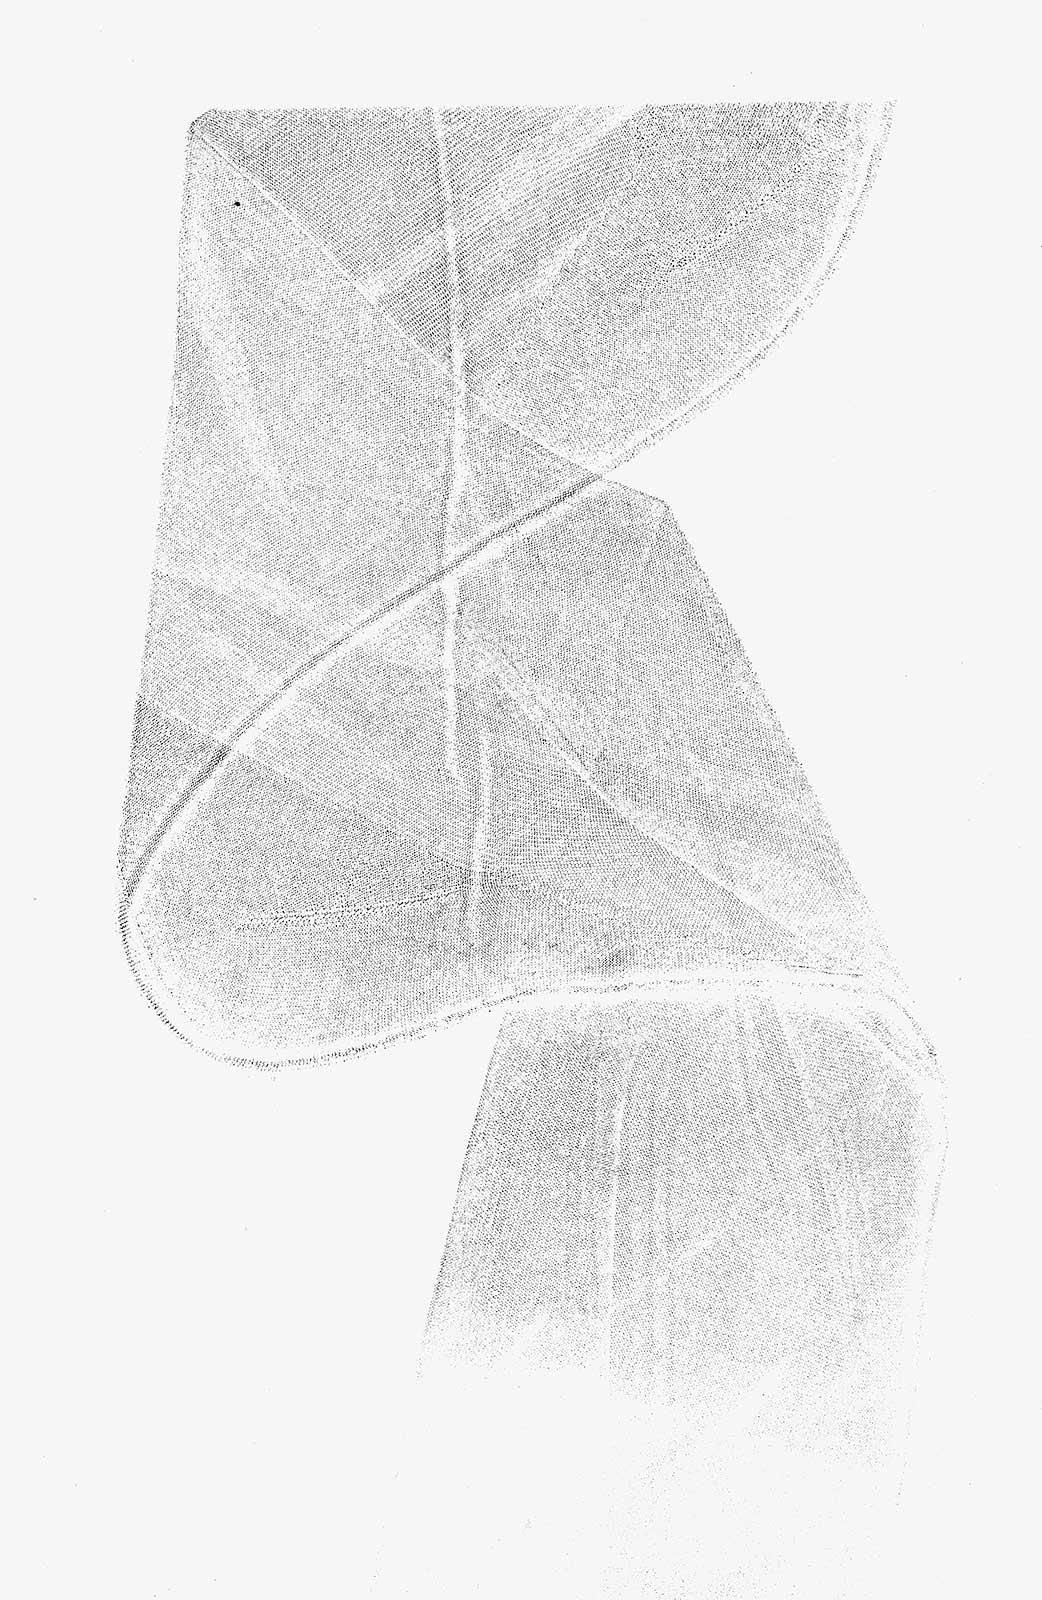 fabian_matz_2015_das_feine_schwarze_lithography